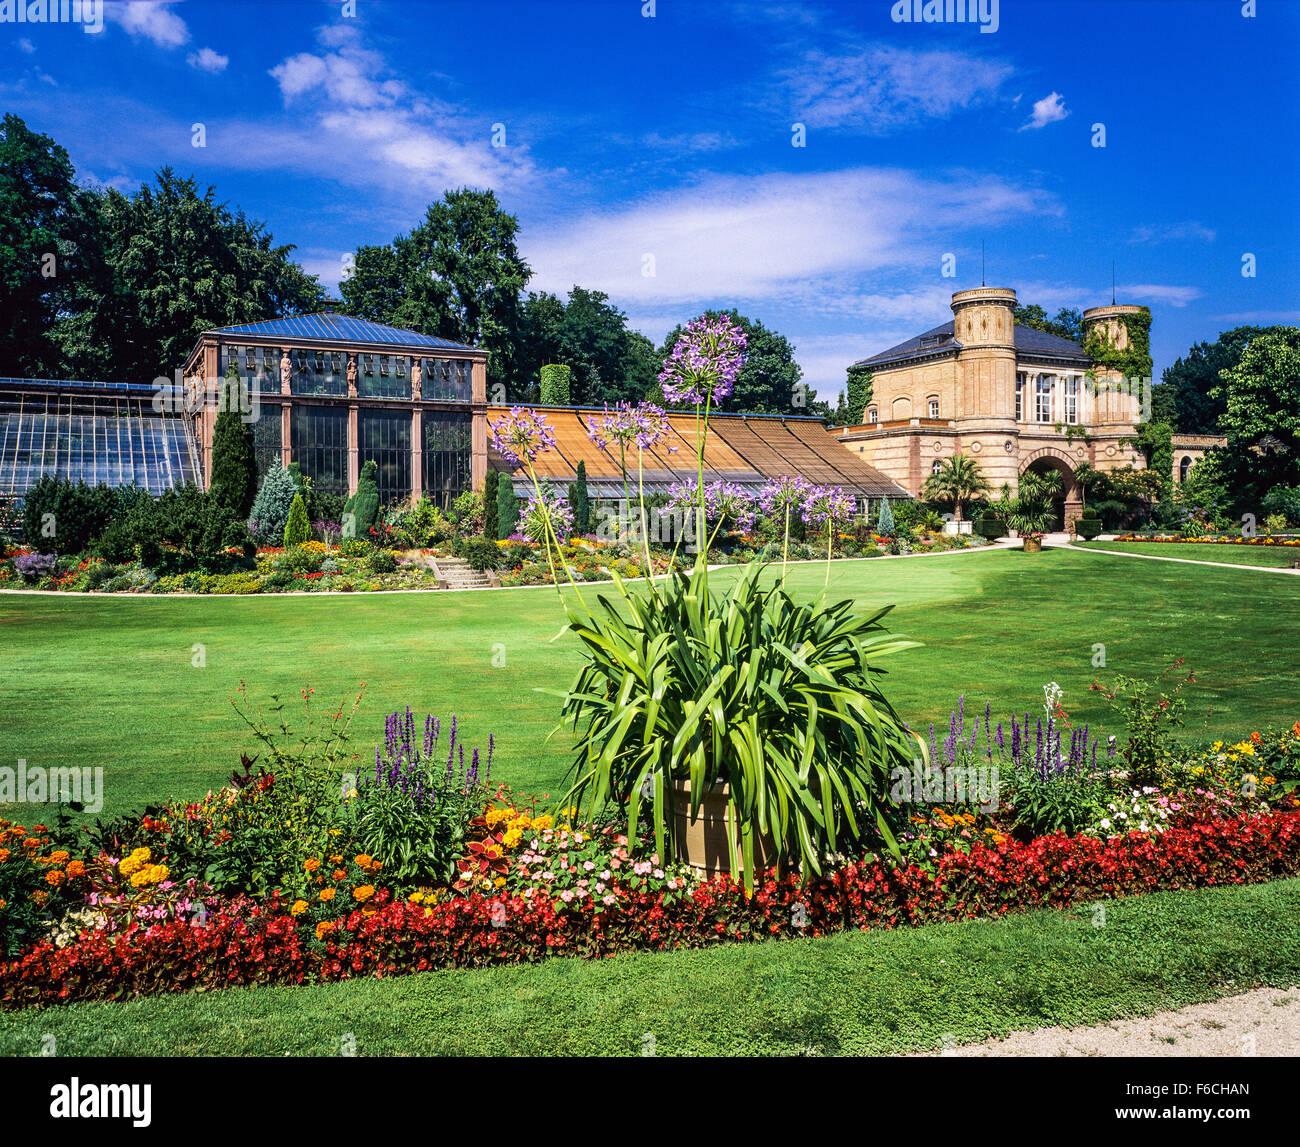 Greenhouses And Gate House Botanischer Garten Botanical Gardens